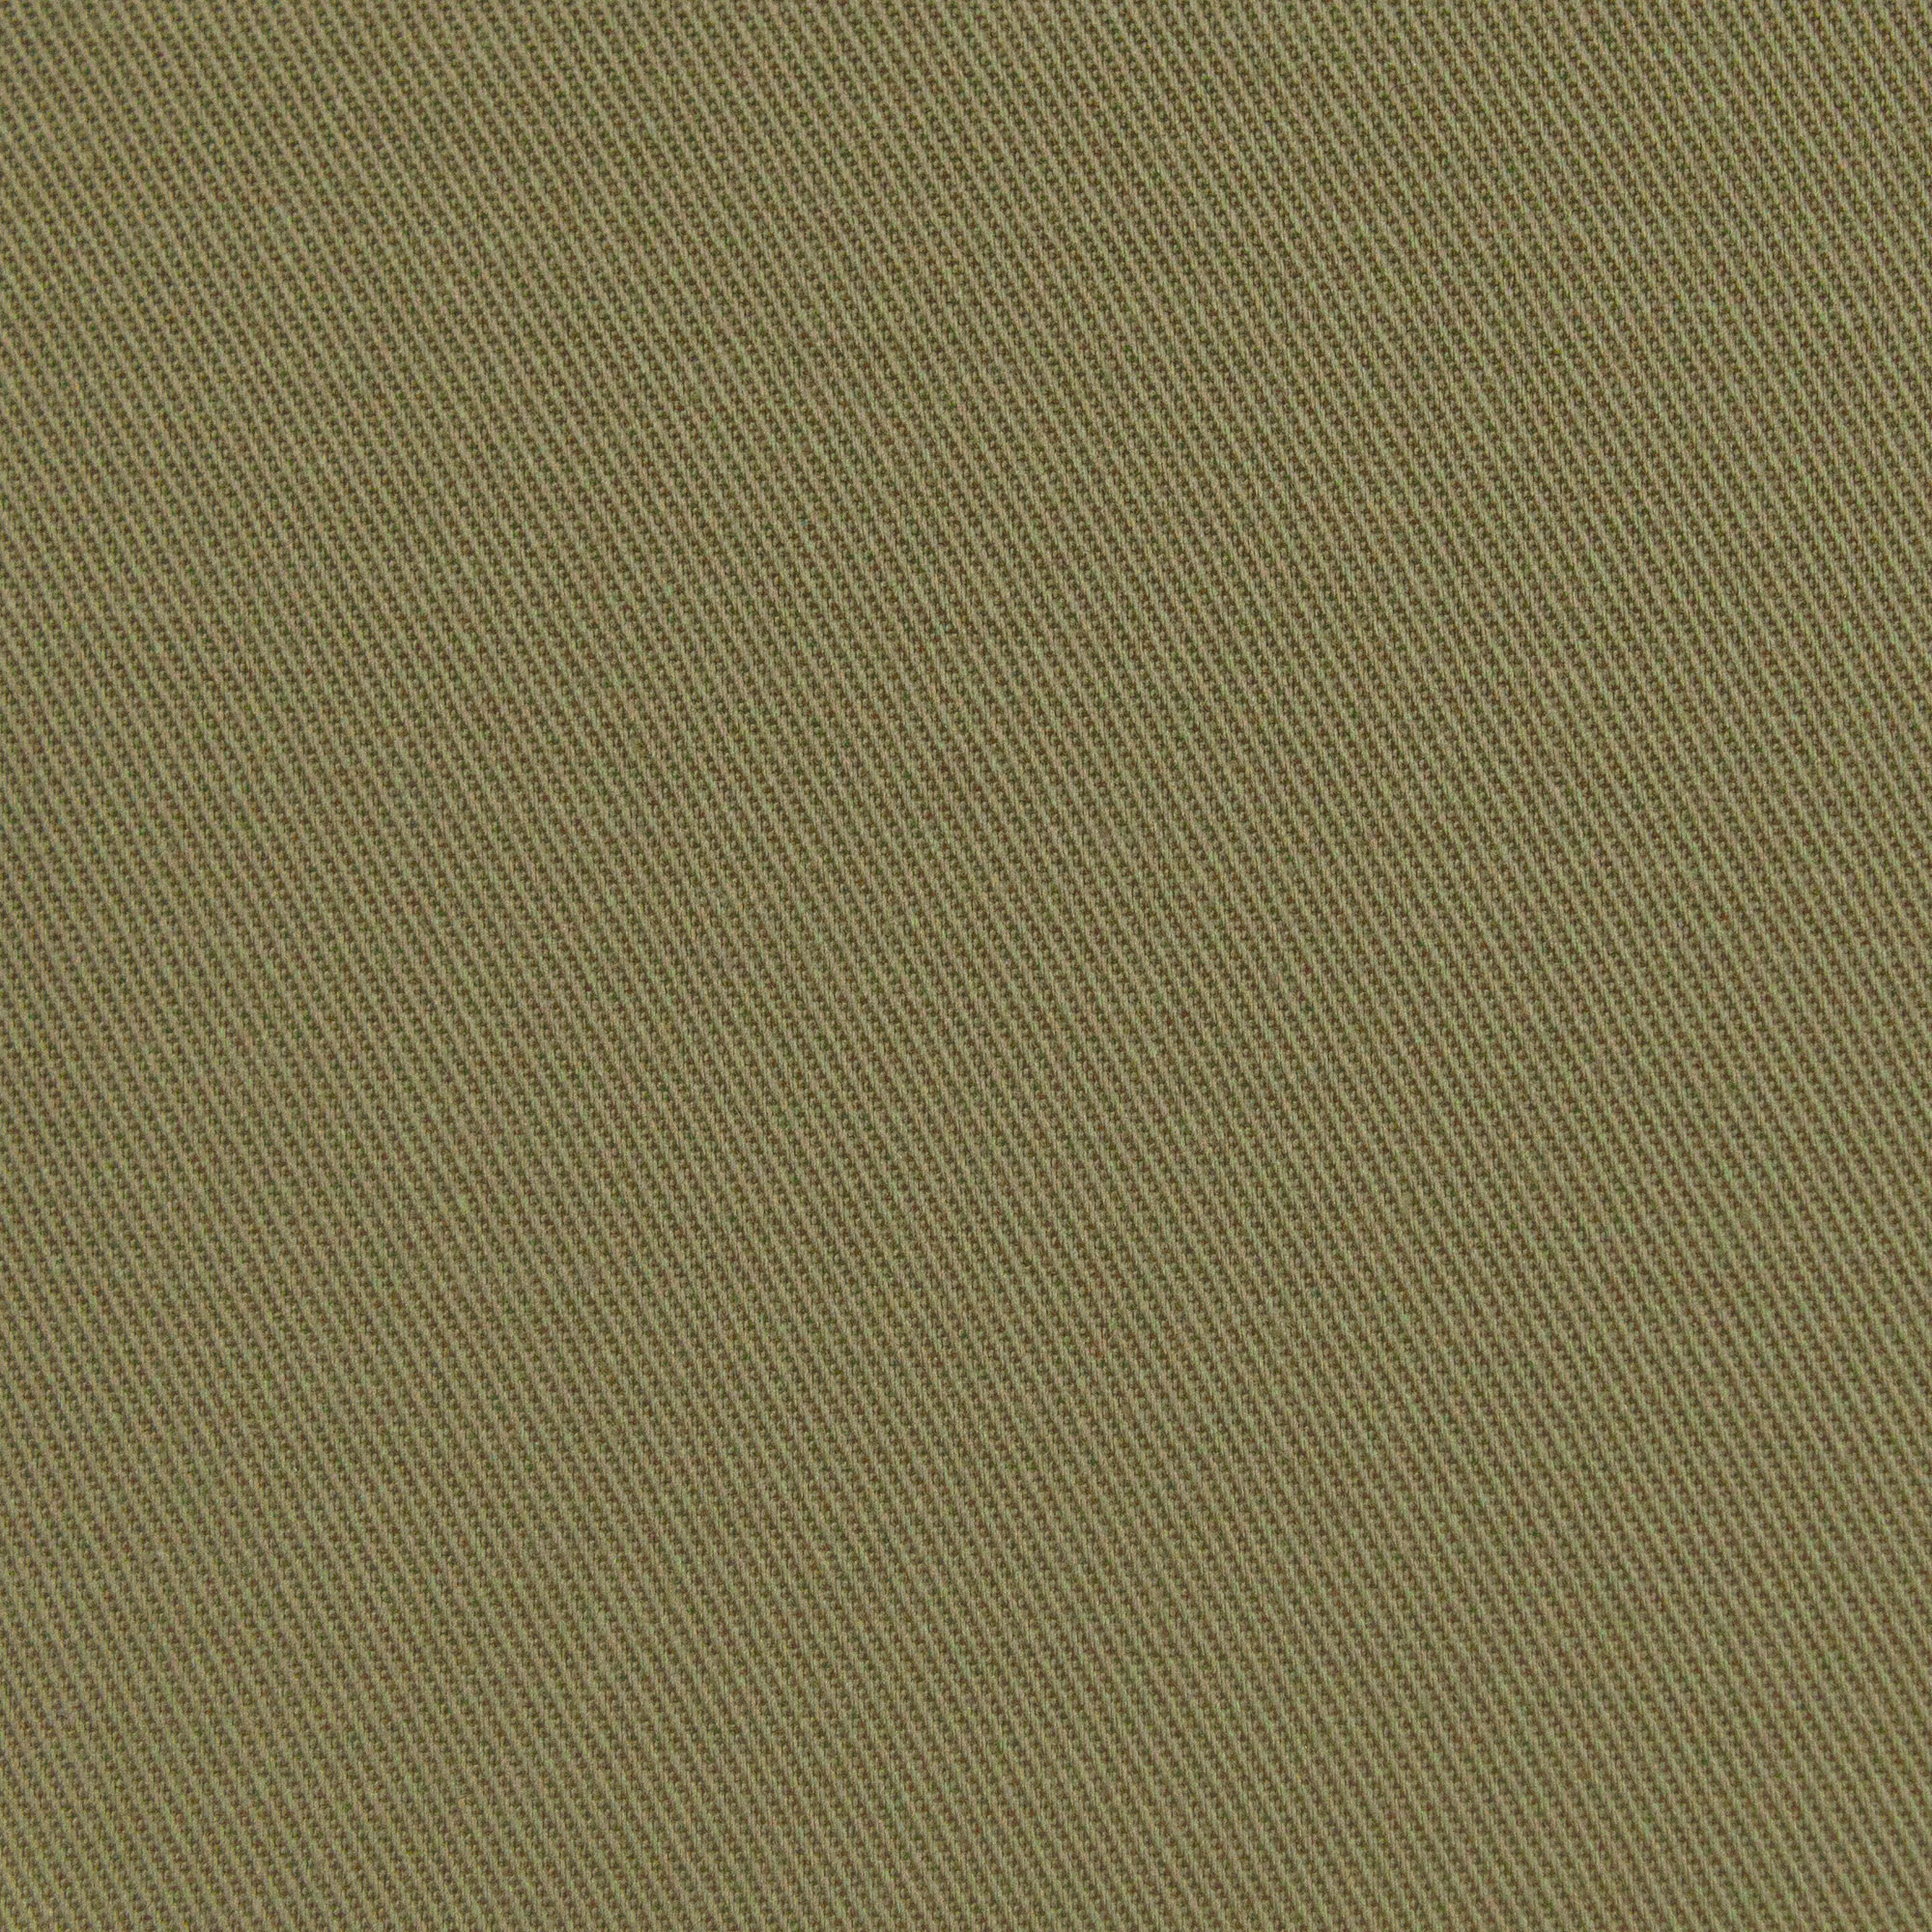 Sz179003 1